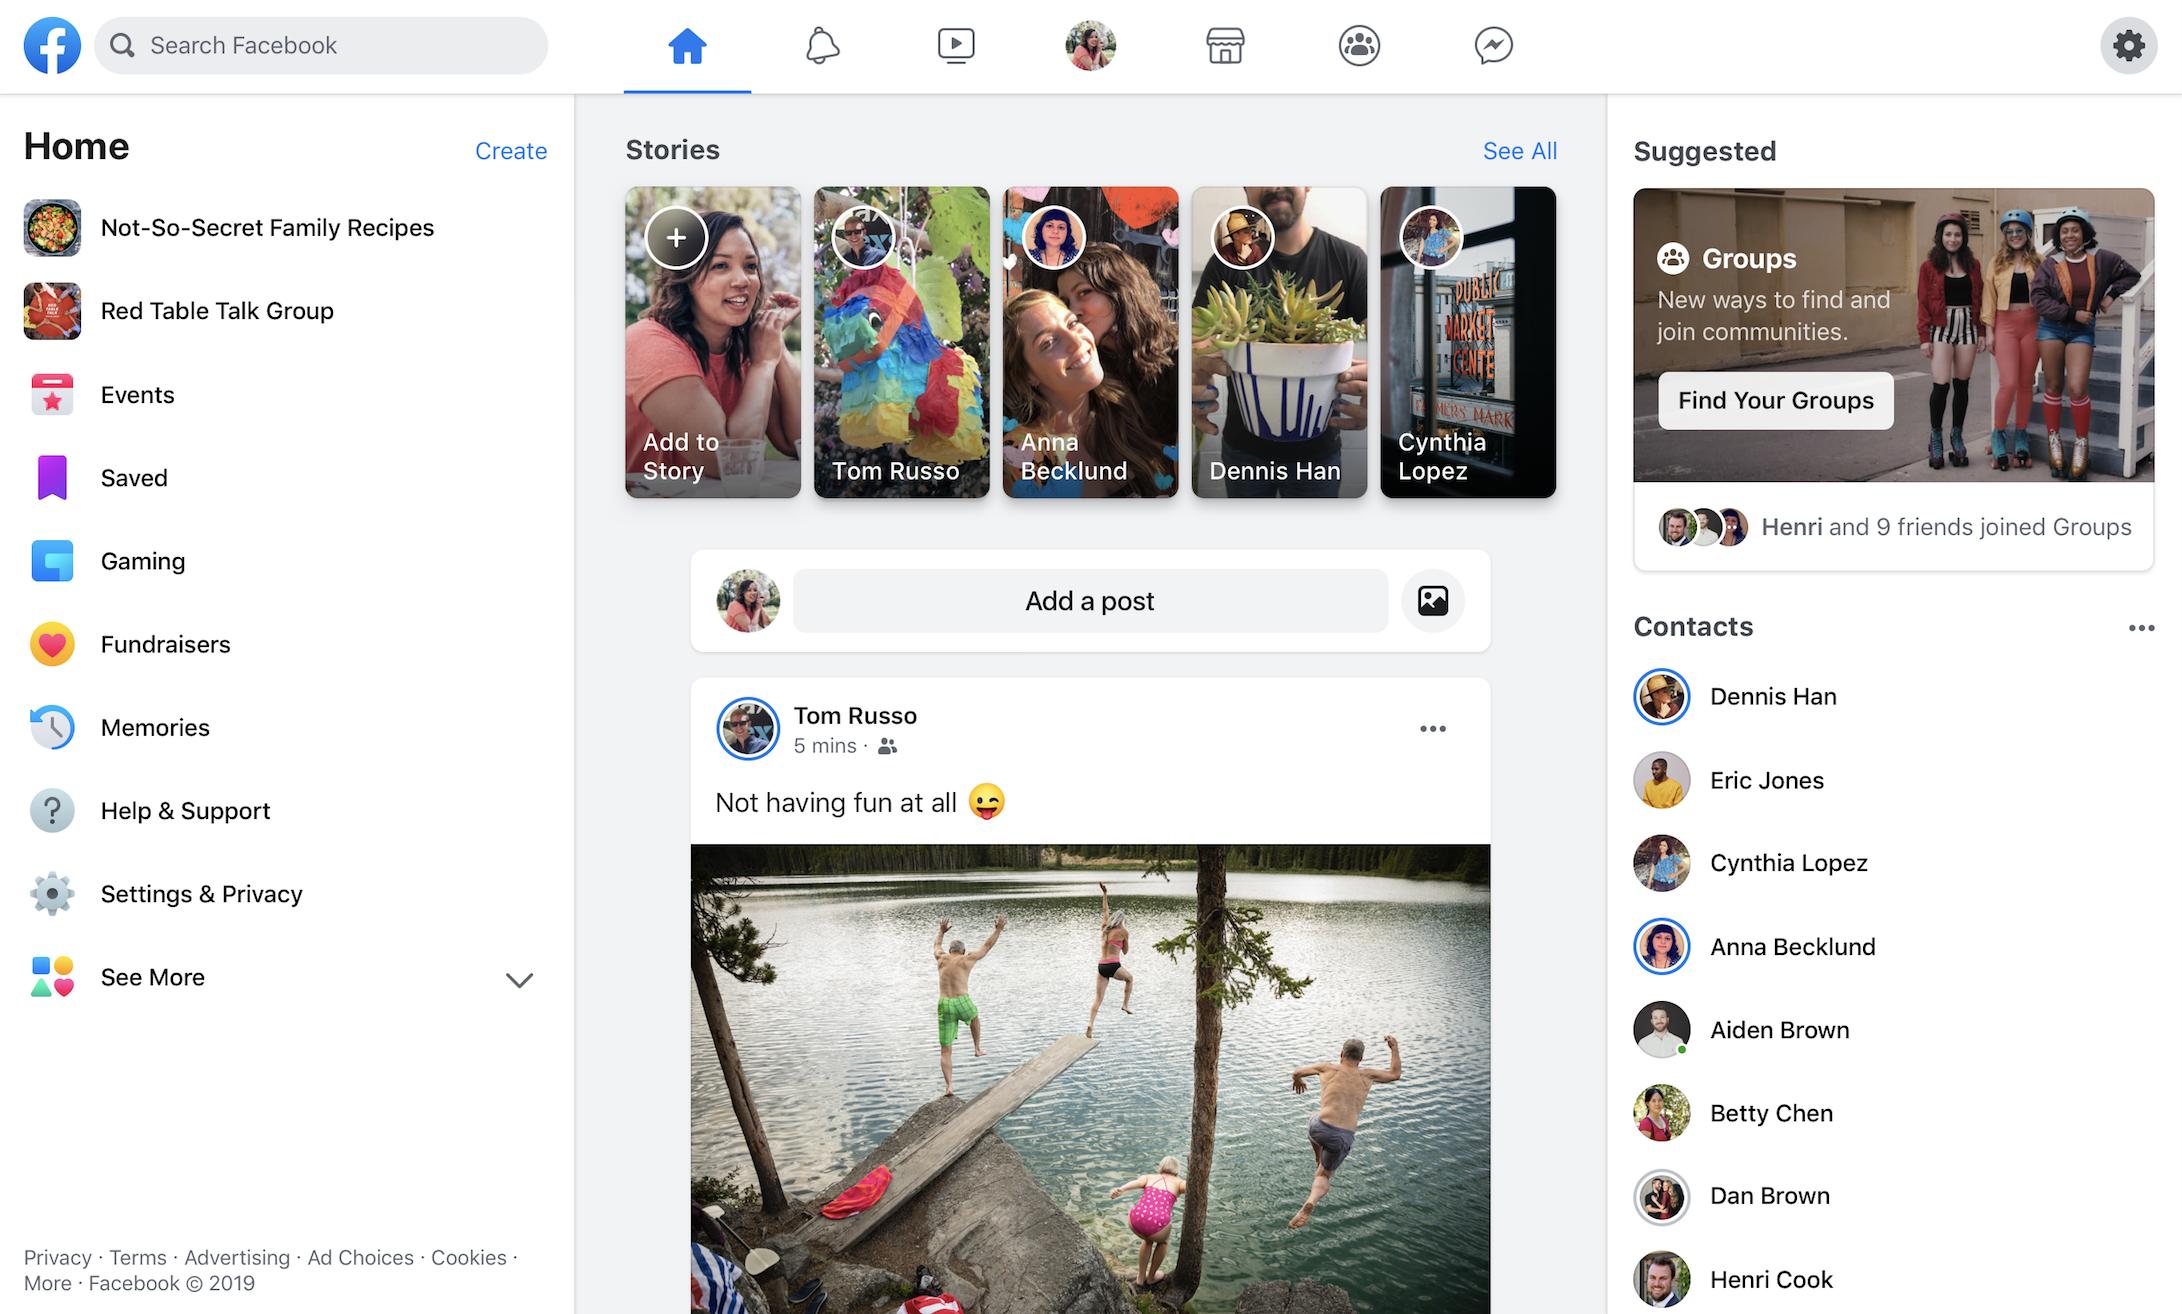 f8-restyling-facebook-app